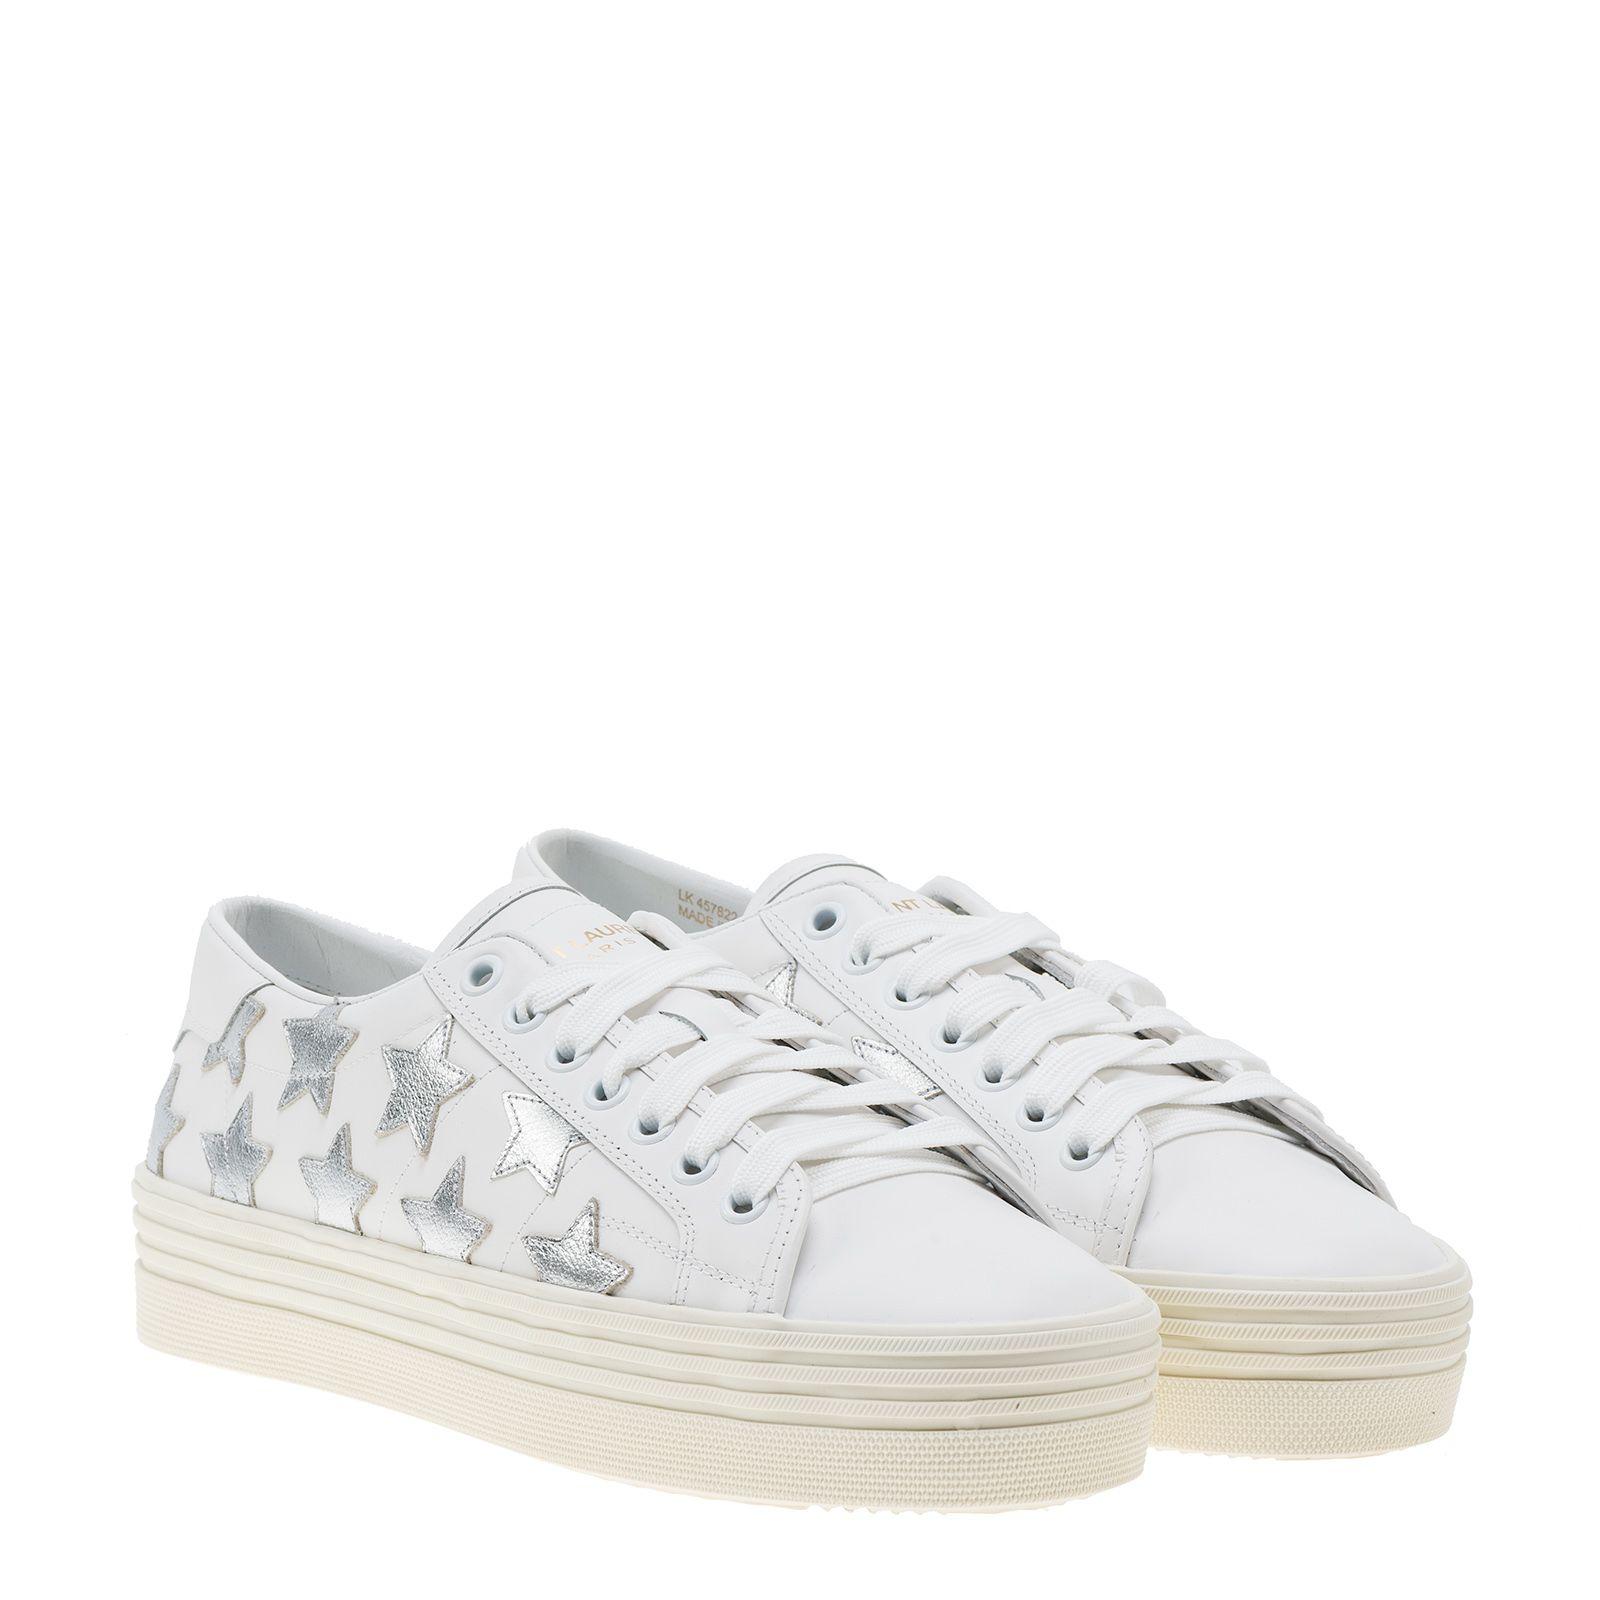 Saint Laurent Signature Court Classic Platform Sneakers